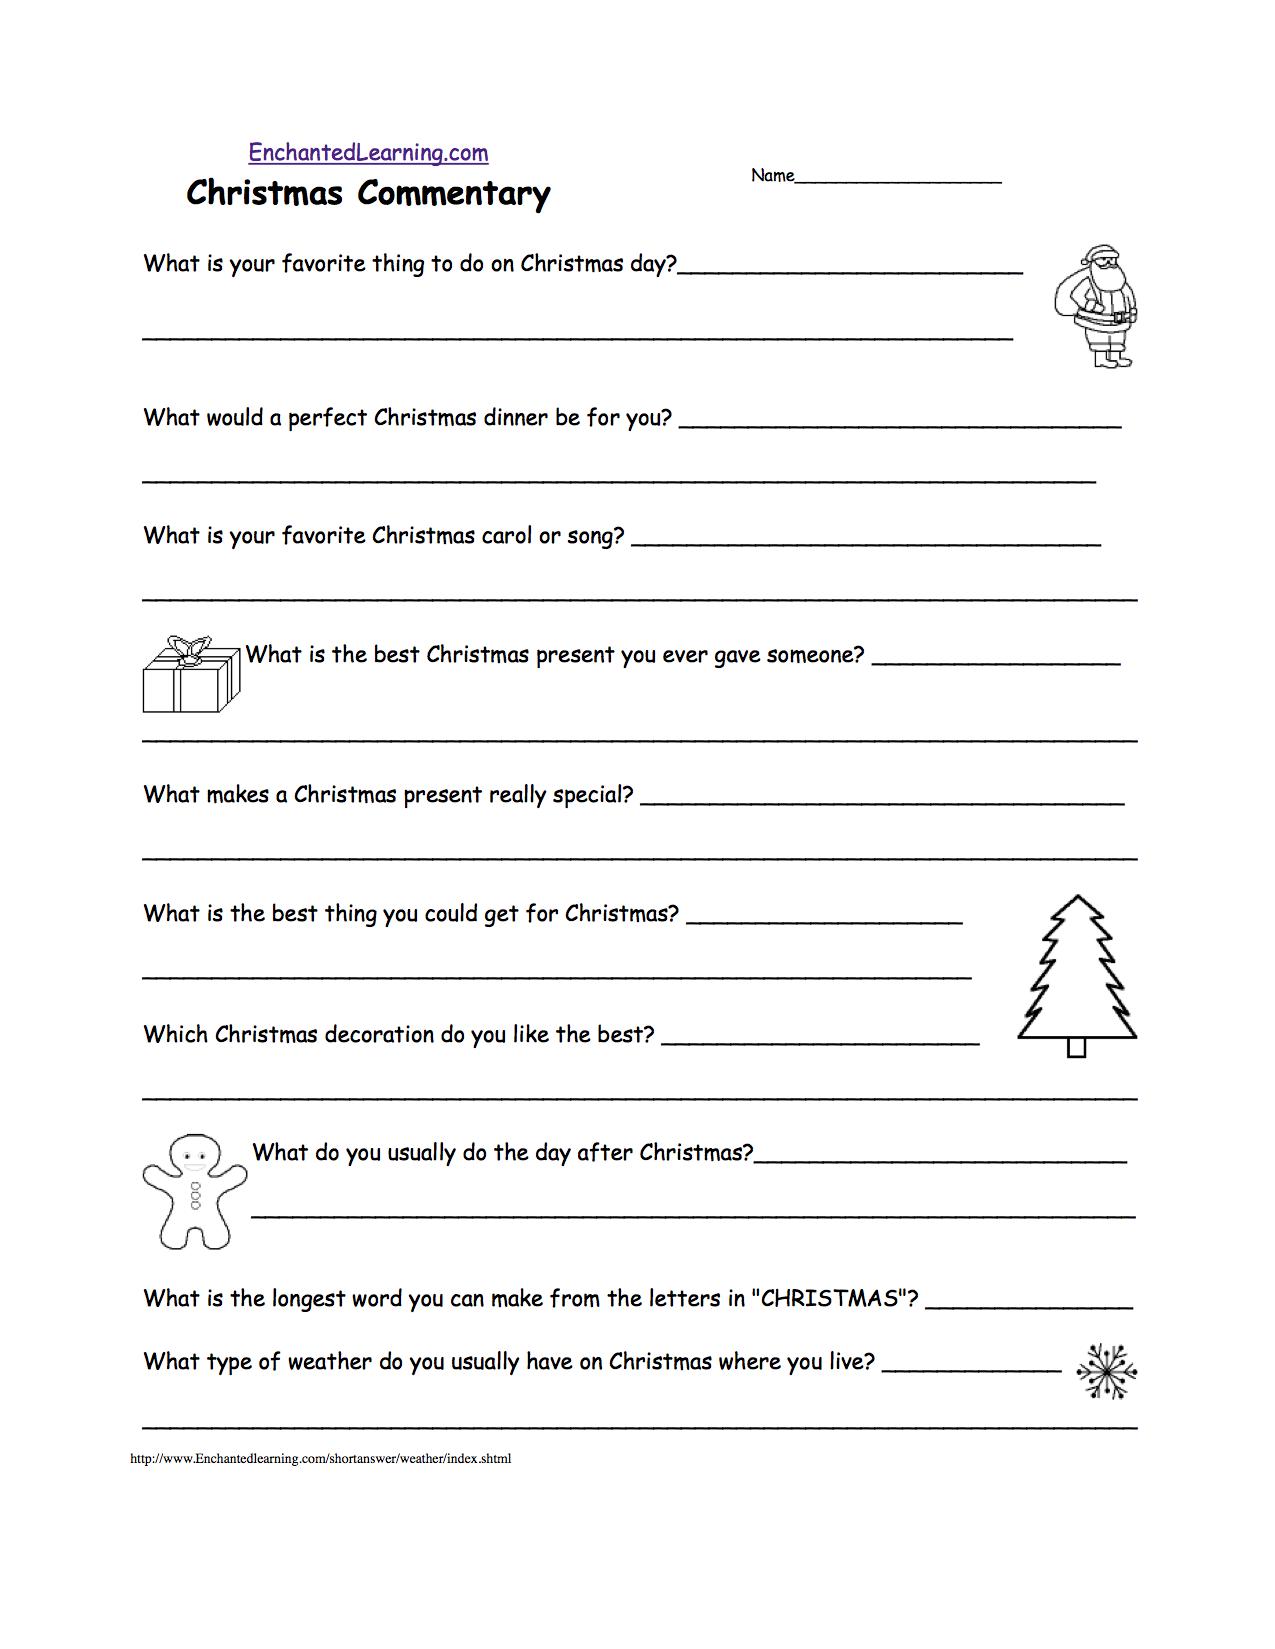 Christmas Activities: Writing Worksheets - Enchantedlearning